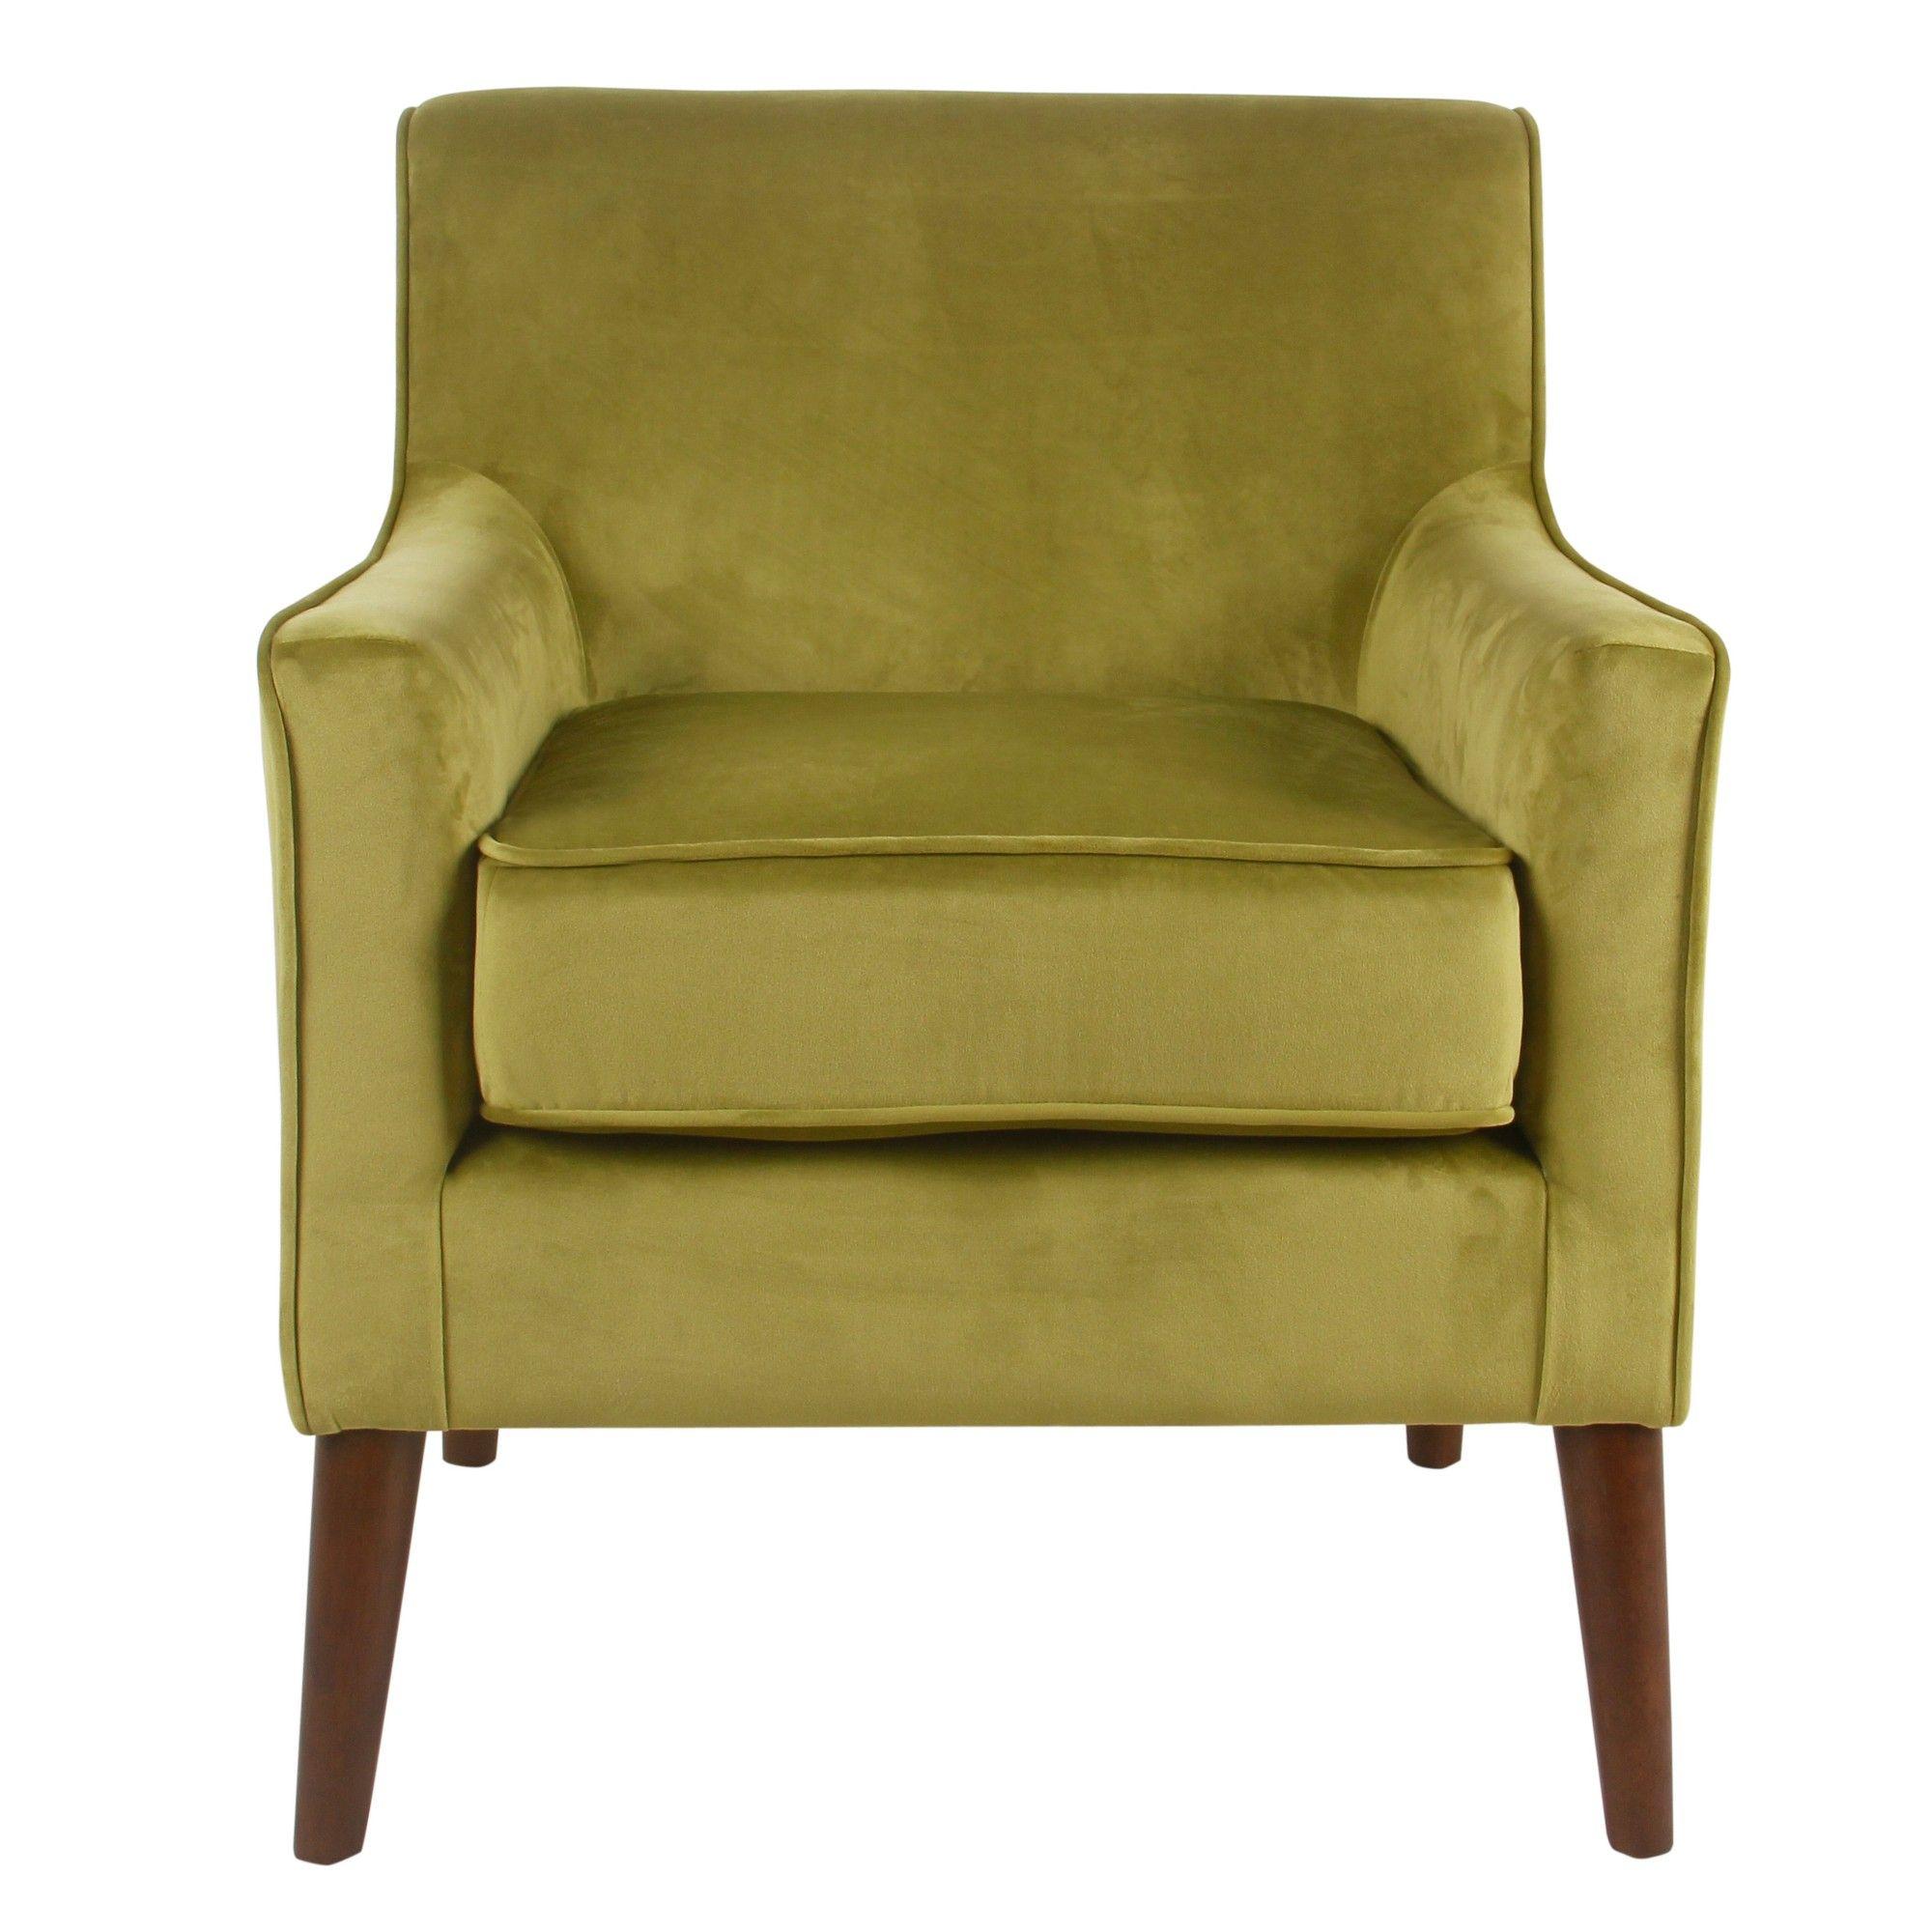 Park Art My WordPress Blog_Green Velvet Accent Chair With Ottoman